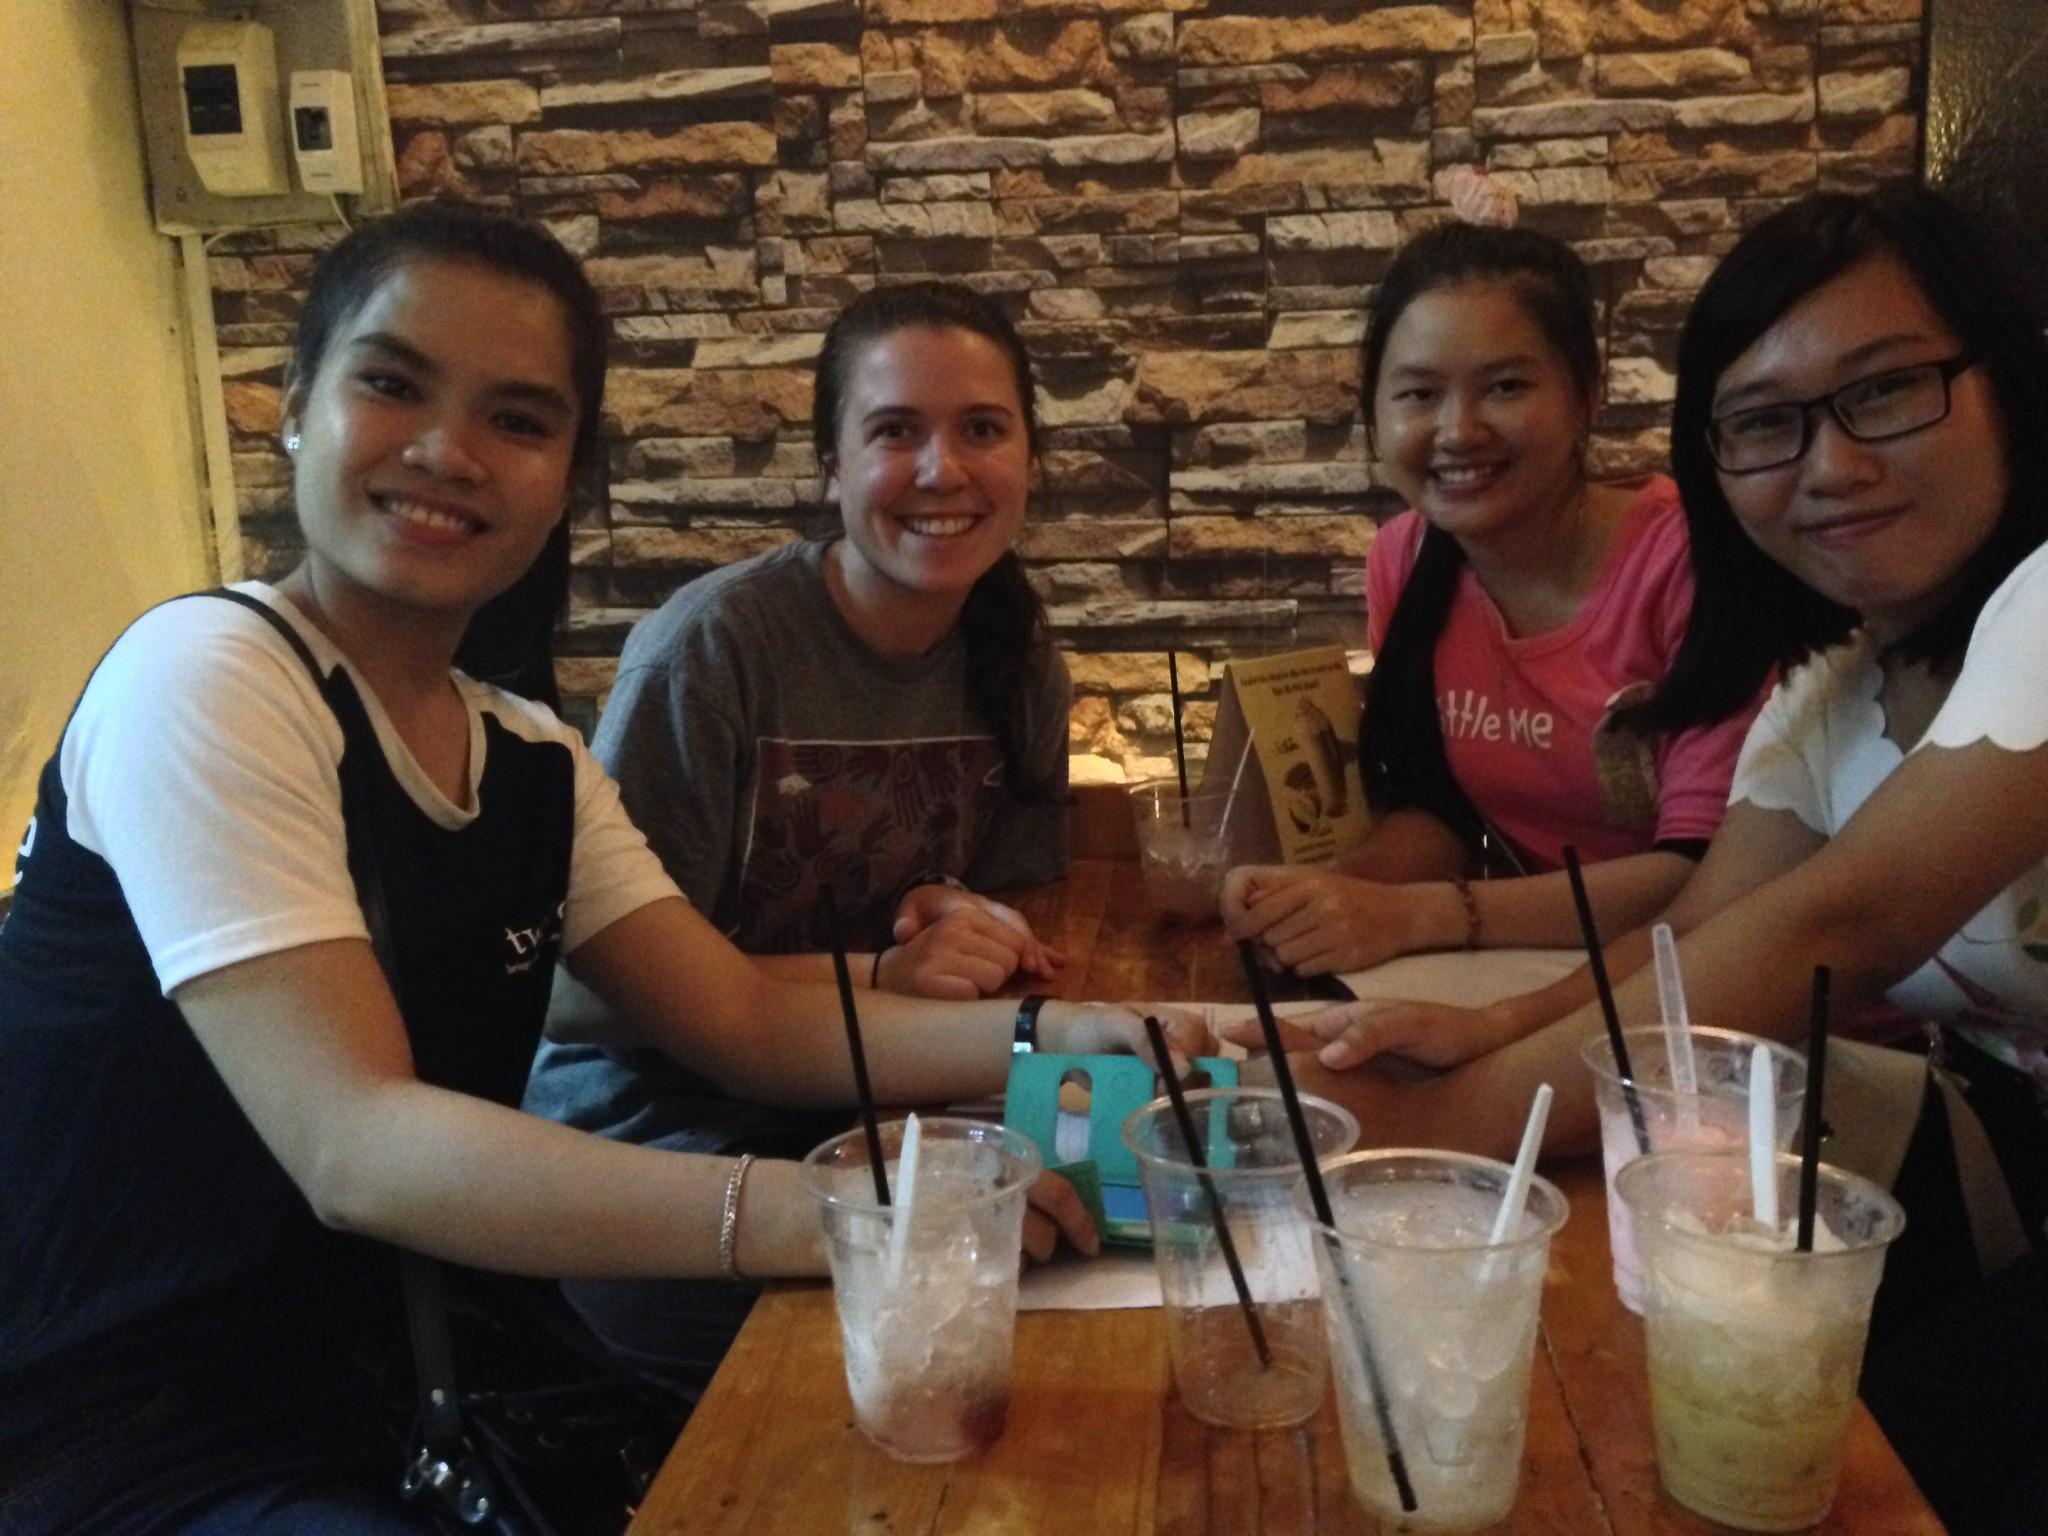 Vietnamese friends at the English Conversation Club